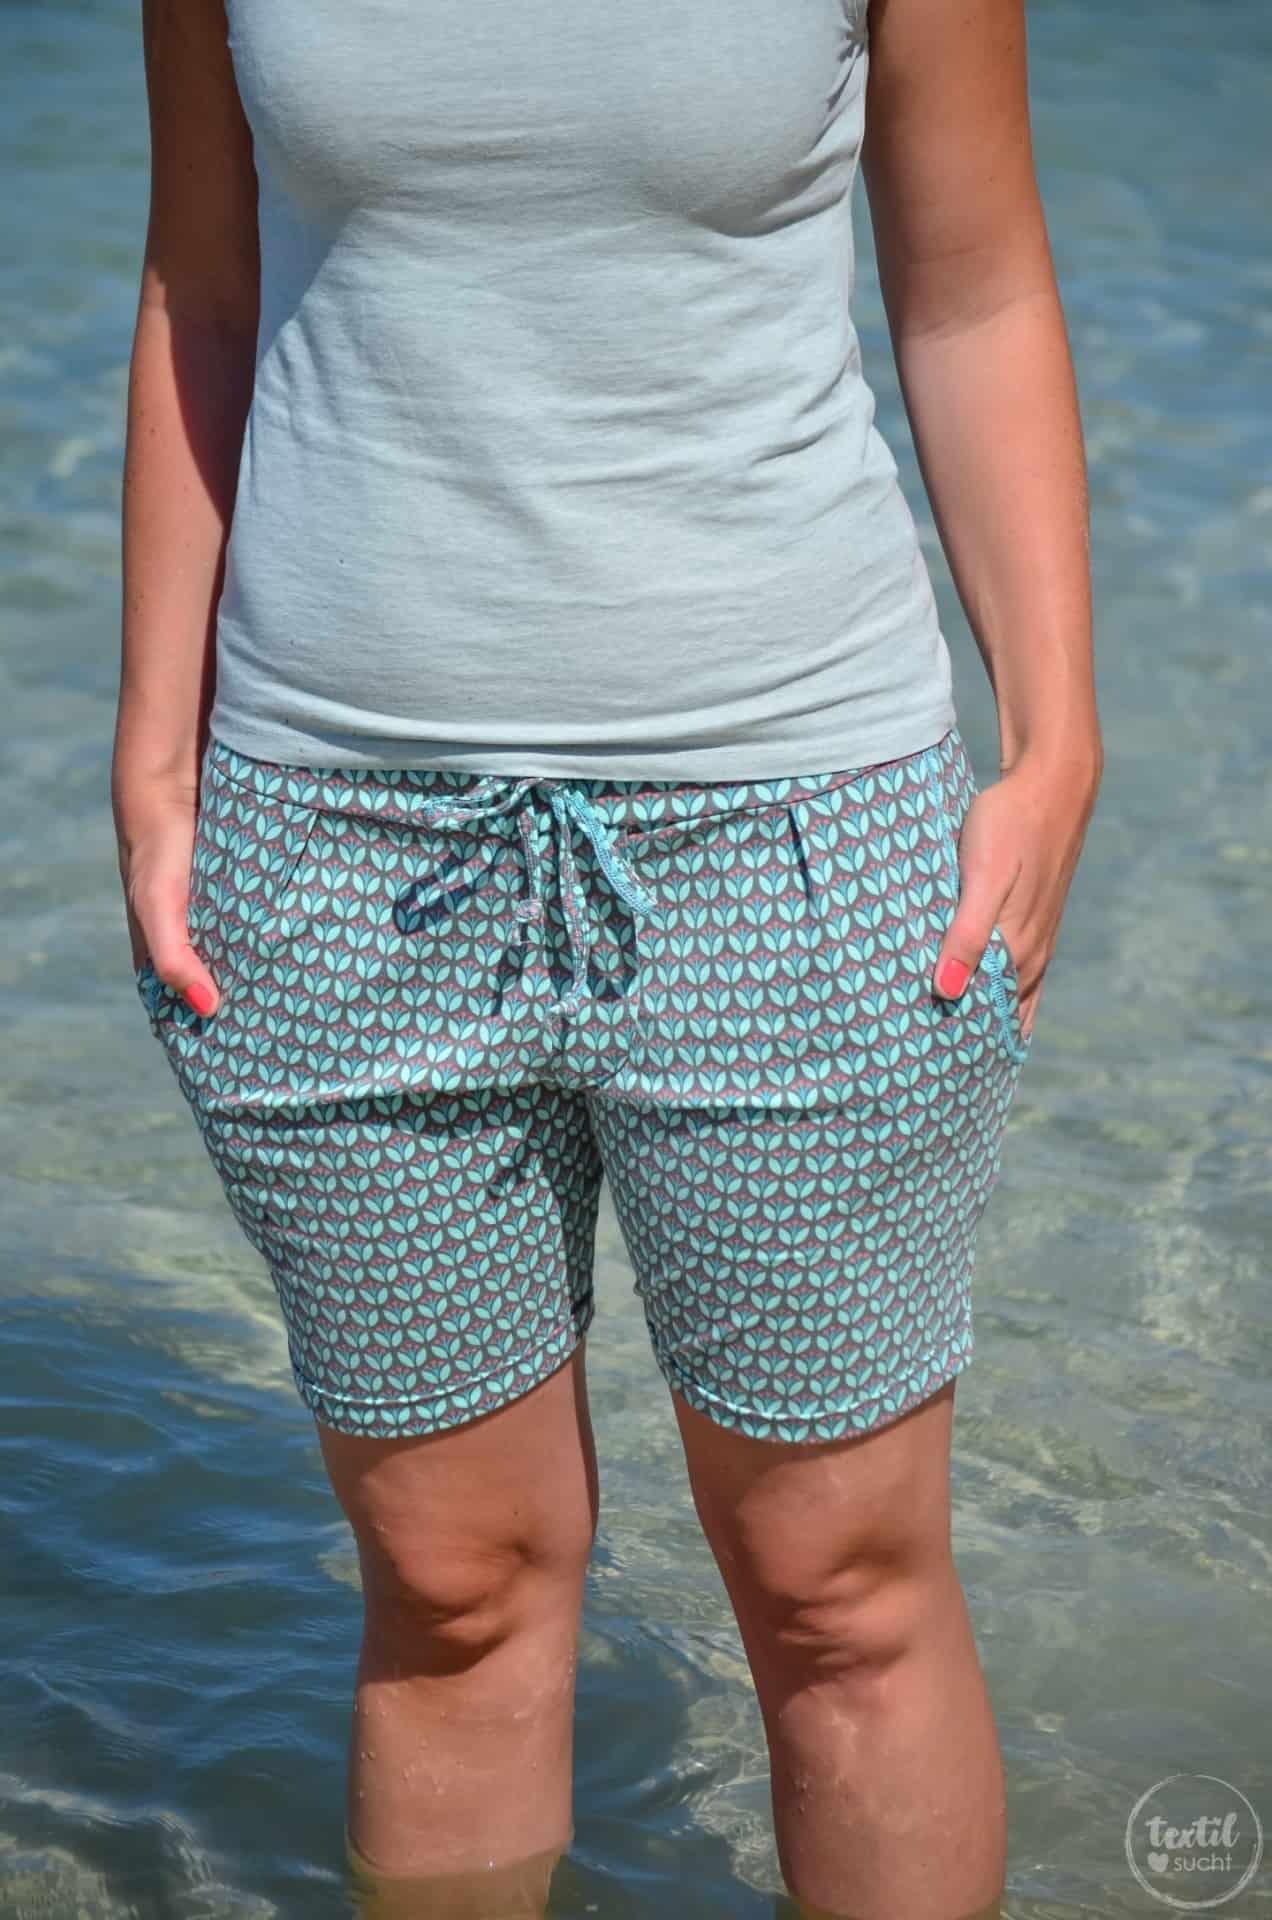 Nähen für den Strand: Schnittmuster Velara als Shorts - Bild 8   textilsucht.de